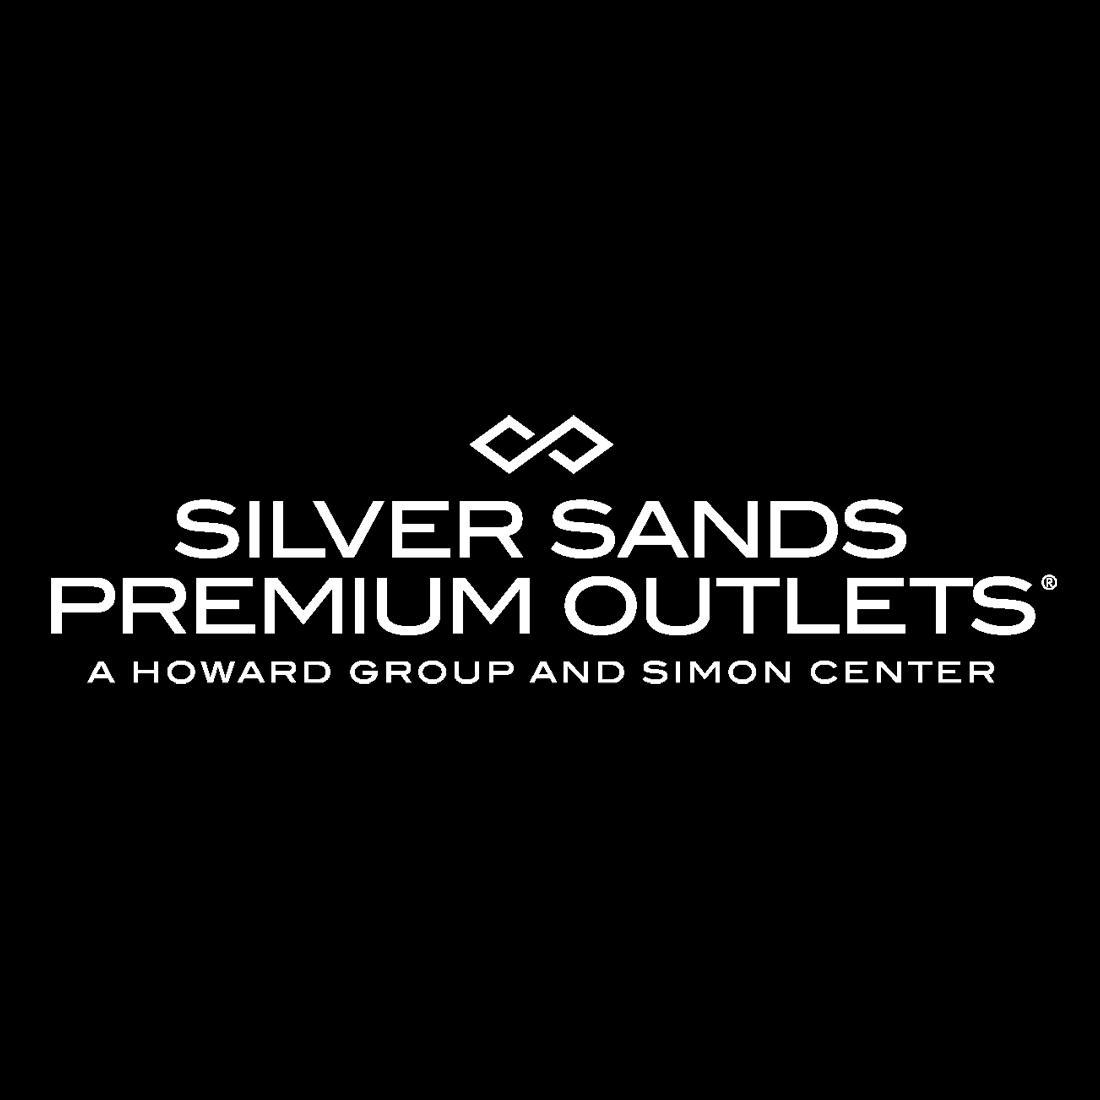 Silver Sands Premium Outlets image 13